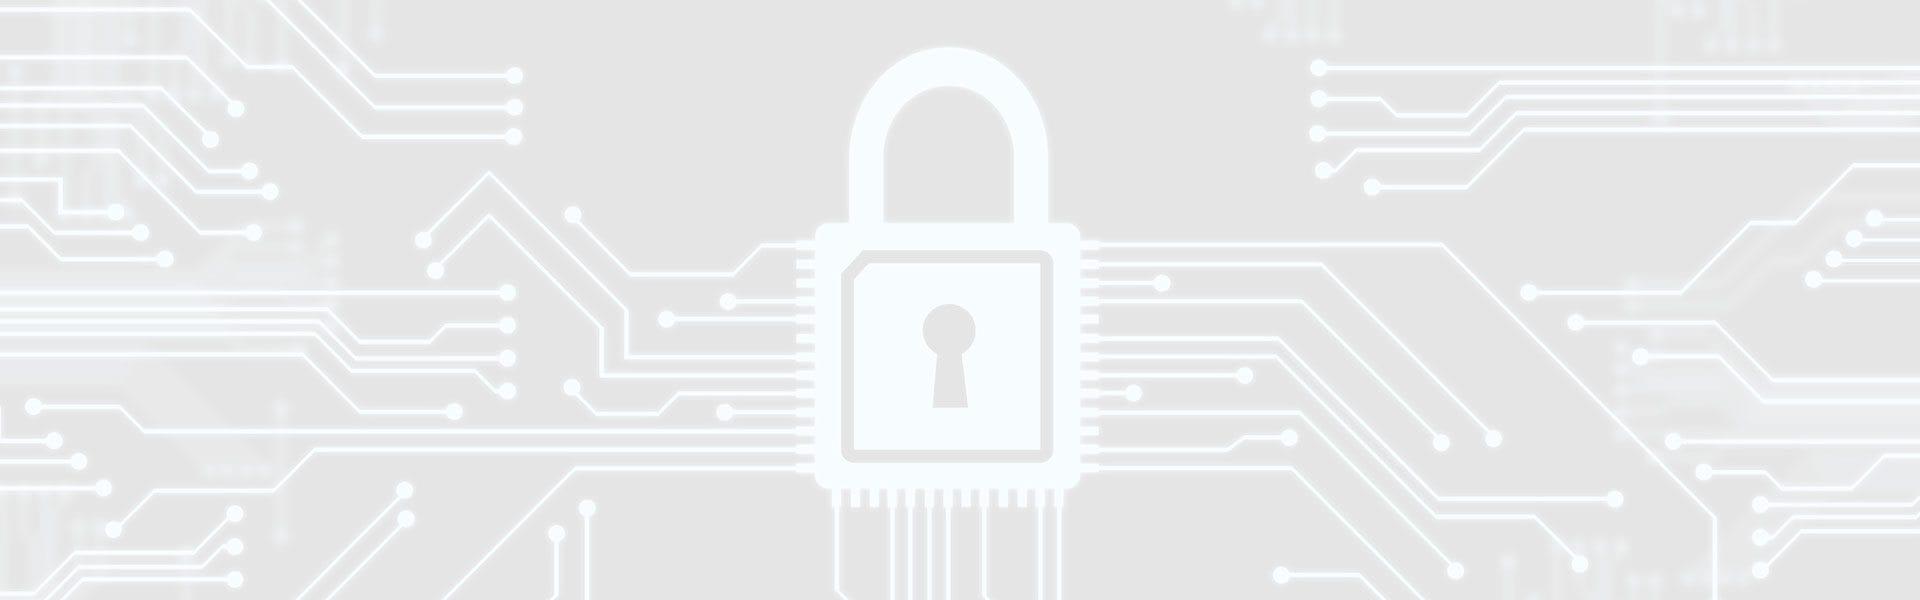 digital-security_1920x600